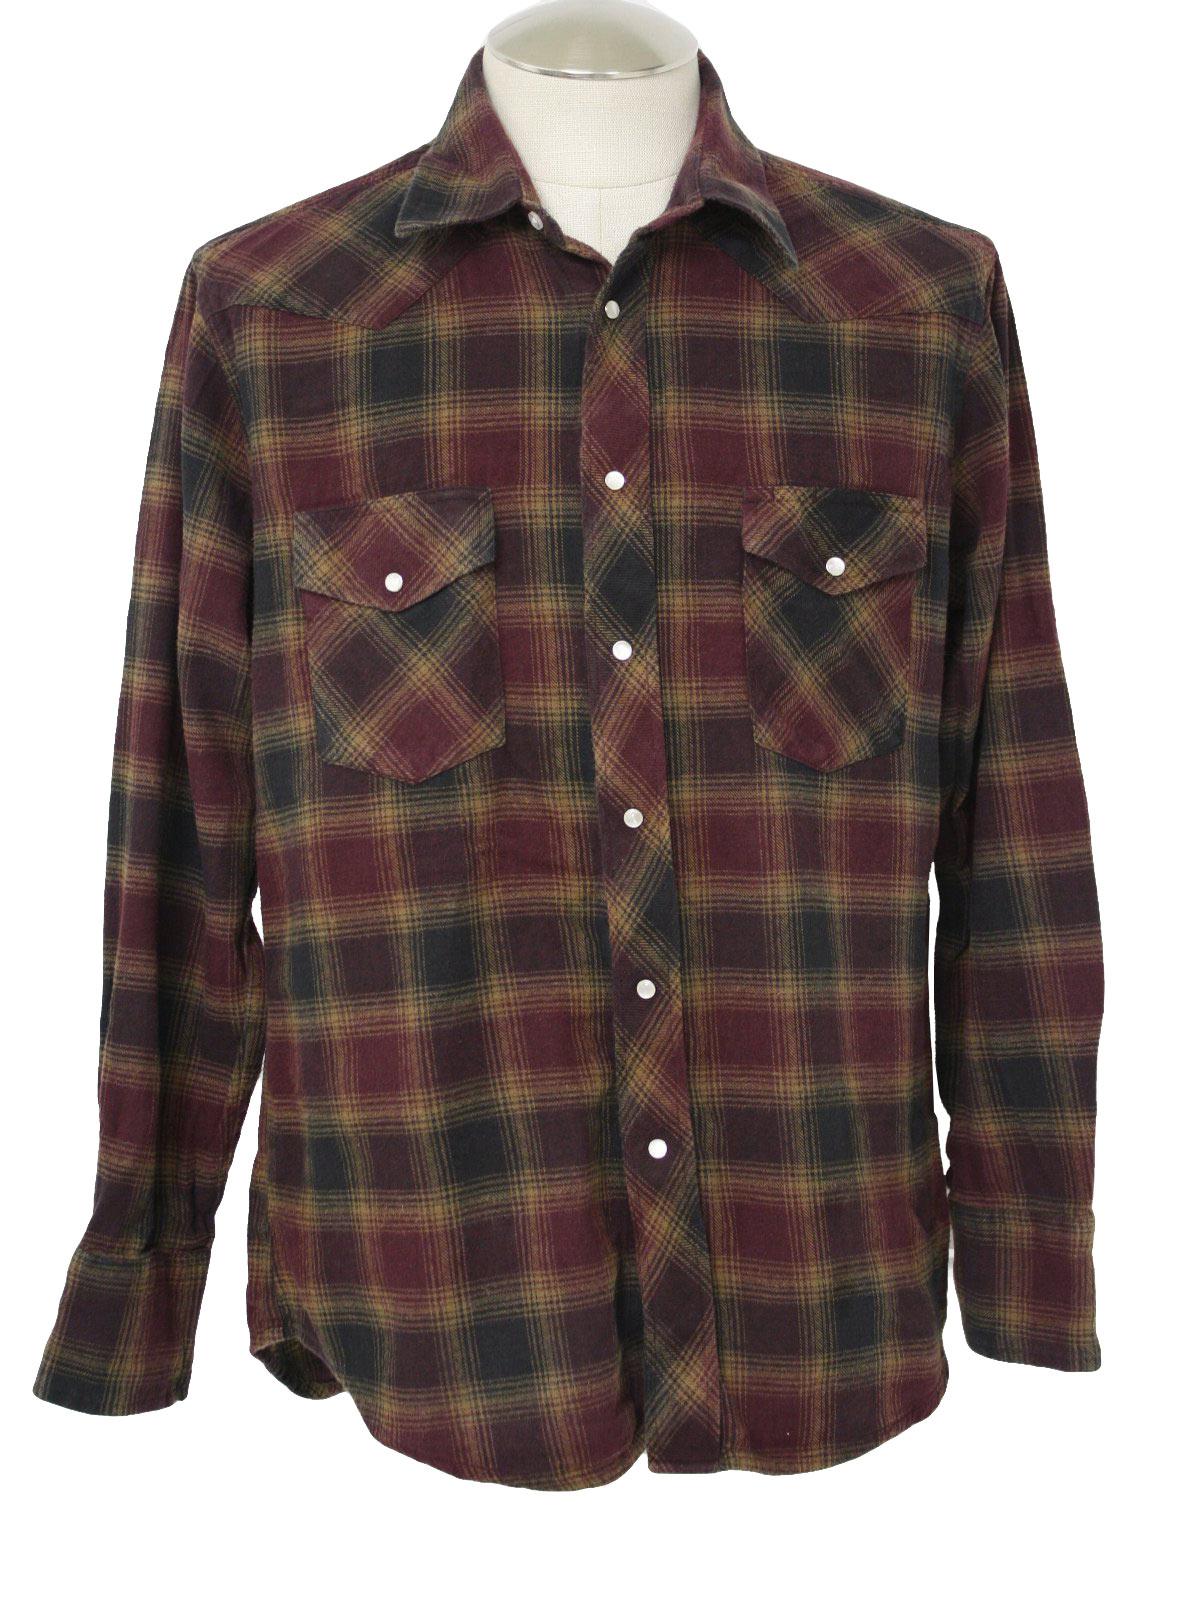 9b856fa15066e 90s Vintage Wrangler Western Shirt  90s -Wrangler- Mens maroon ...